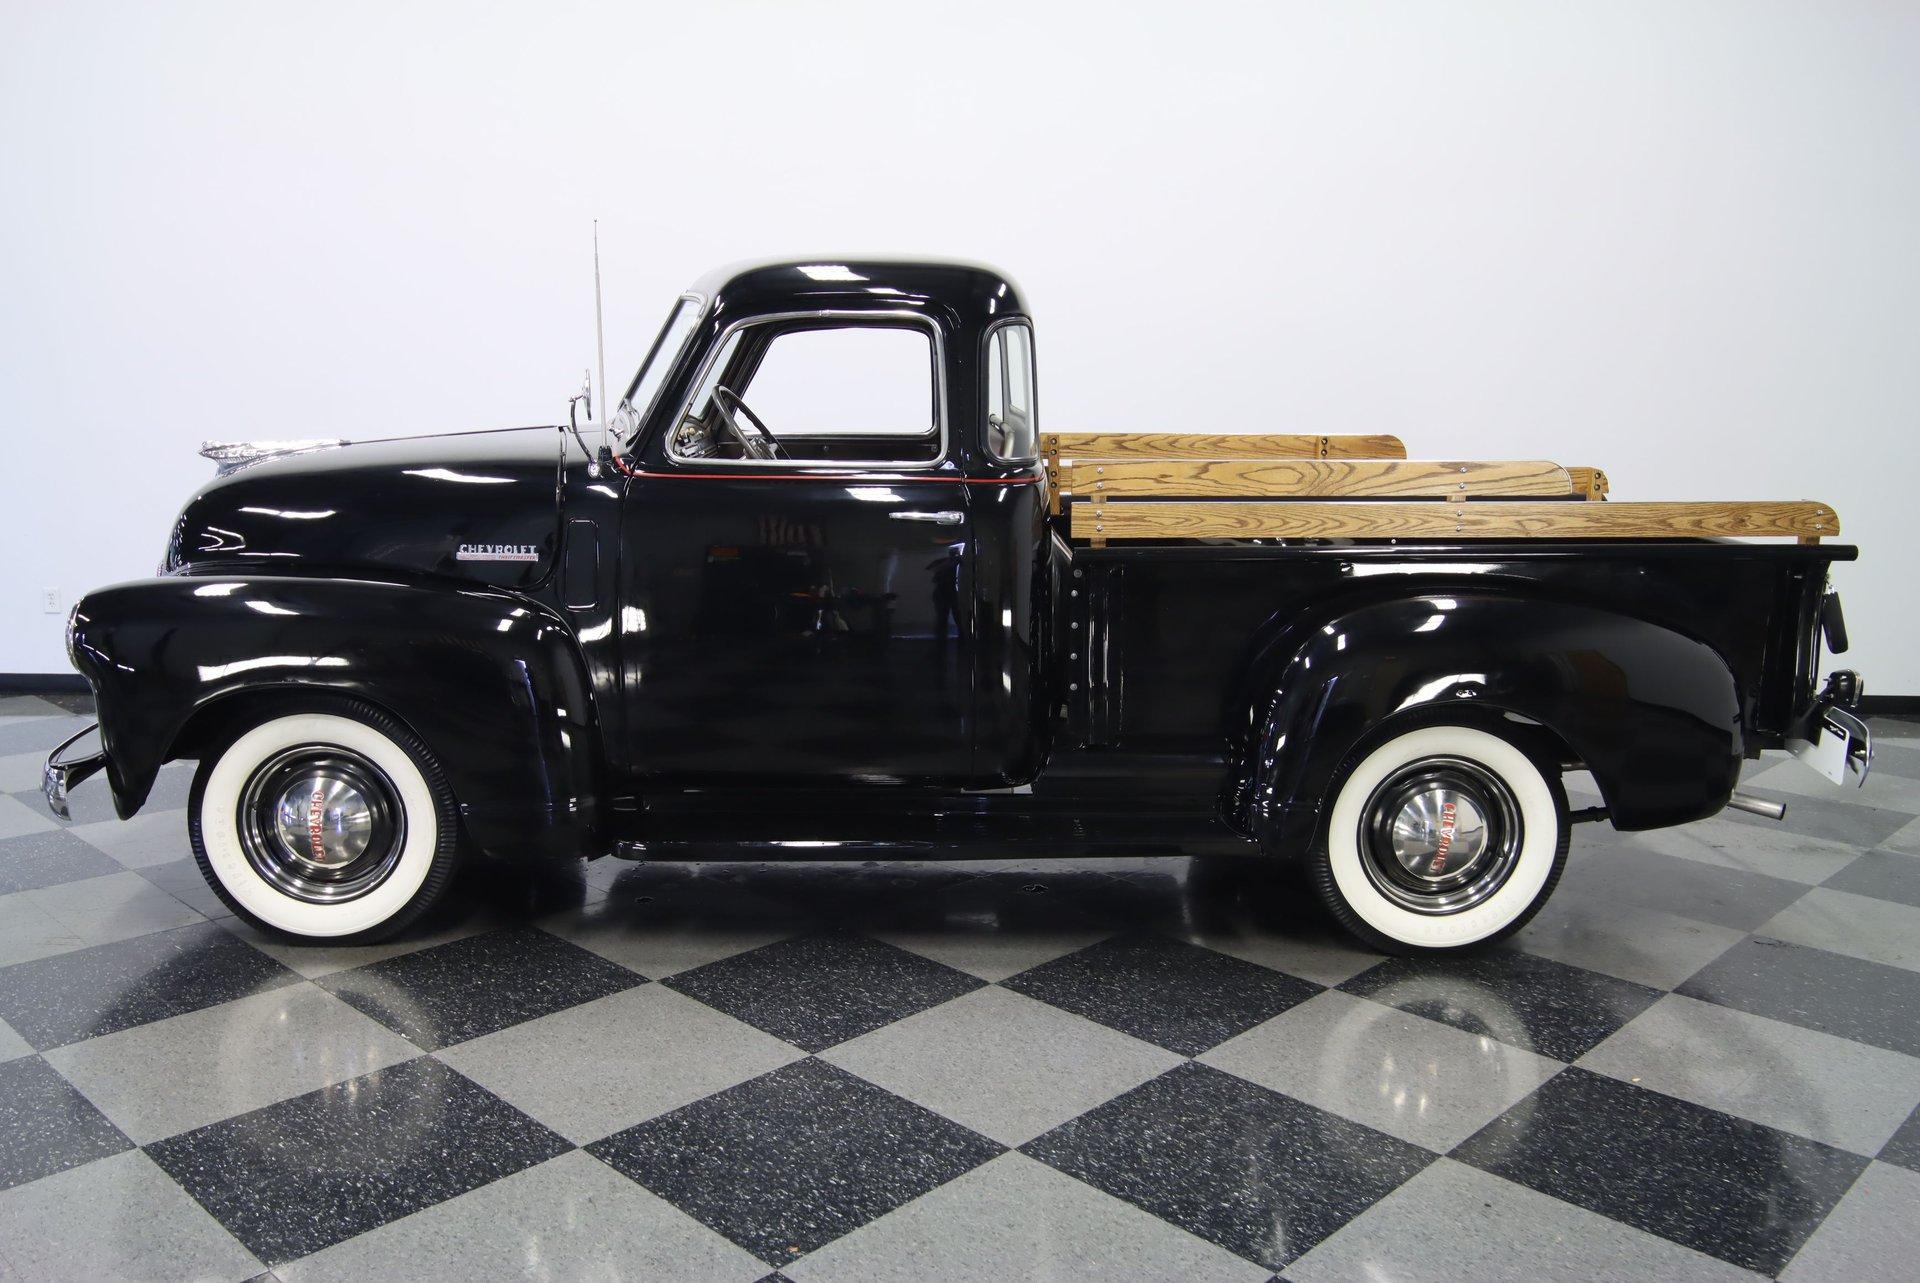 1947 chevrolet 3100 5 window thiftmaster